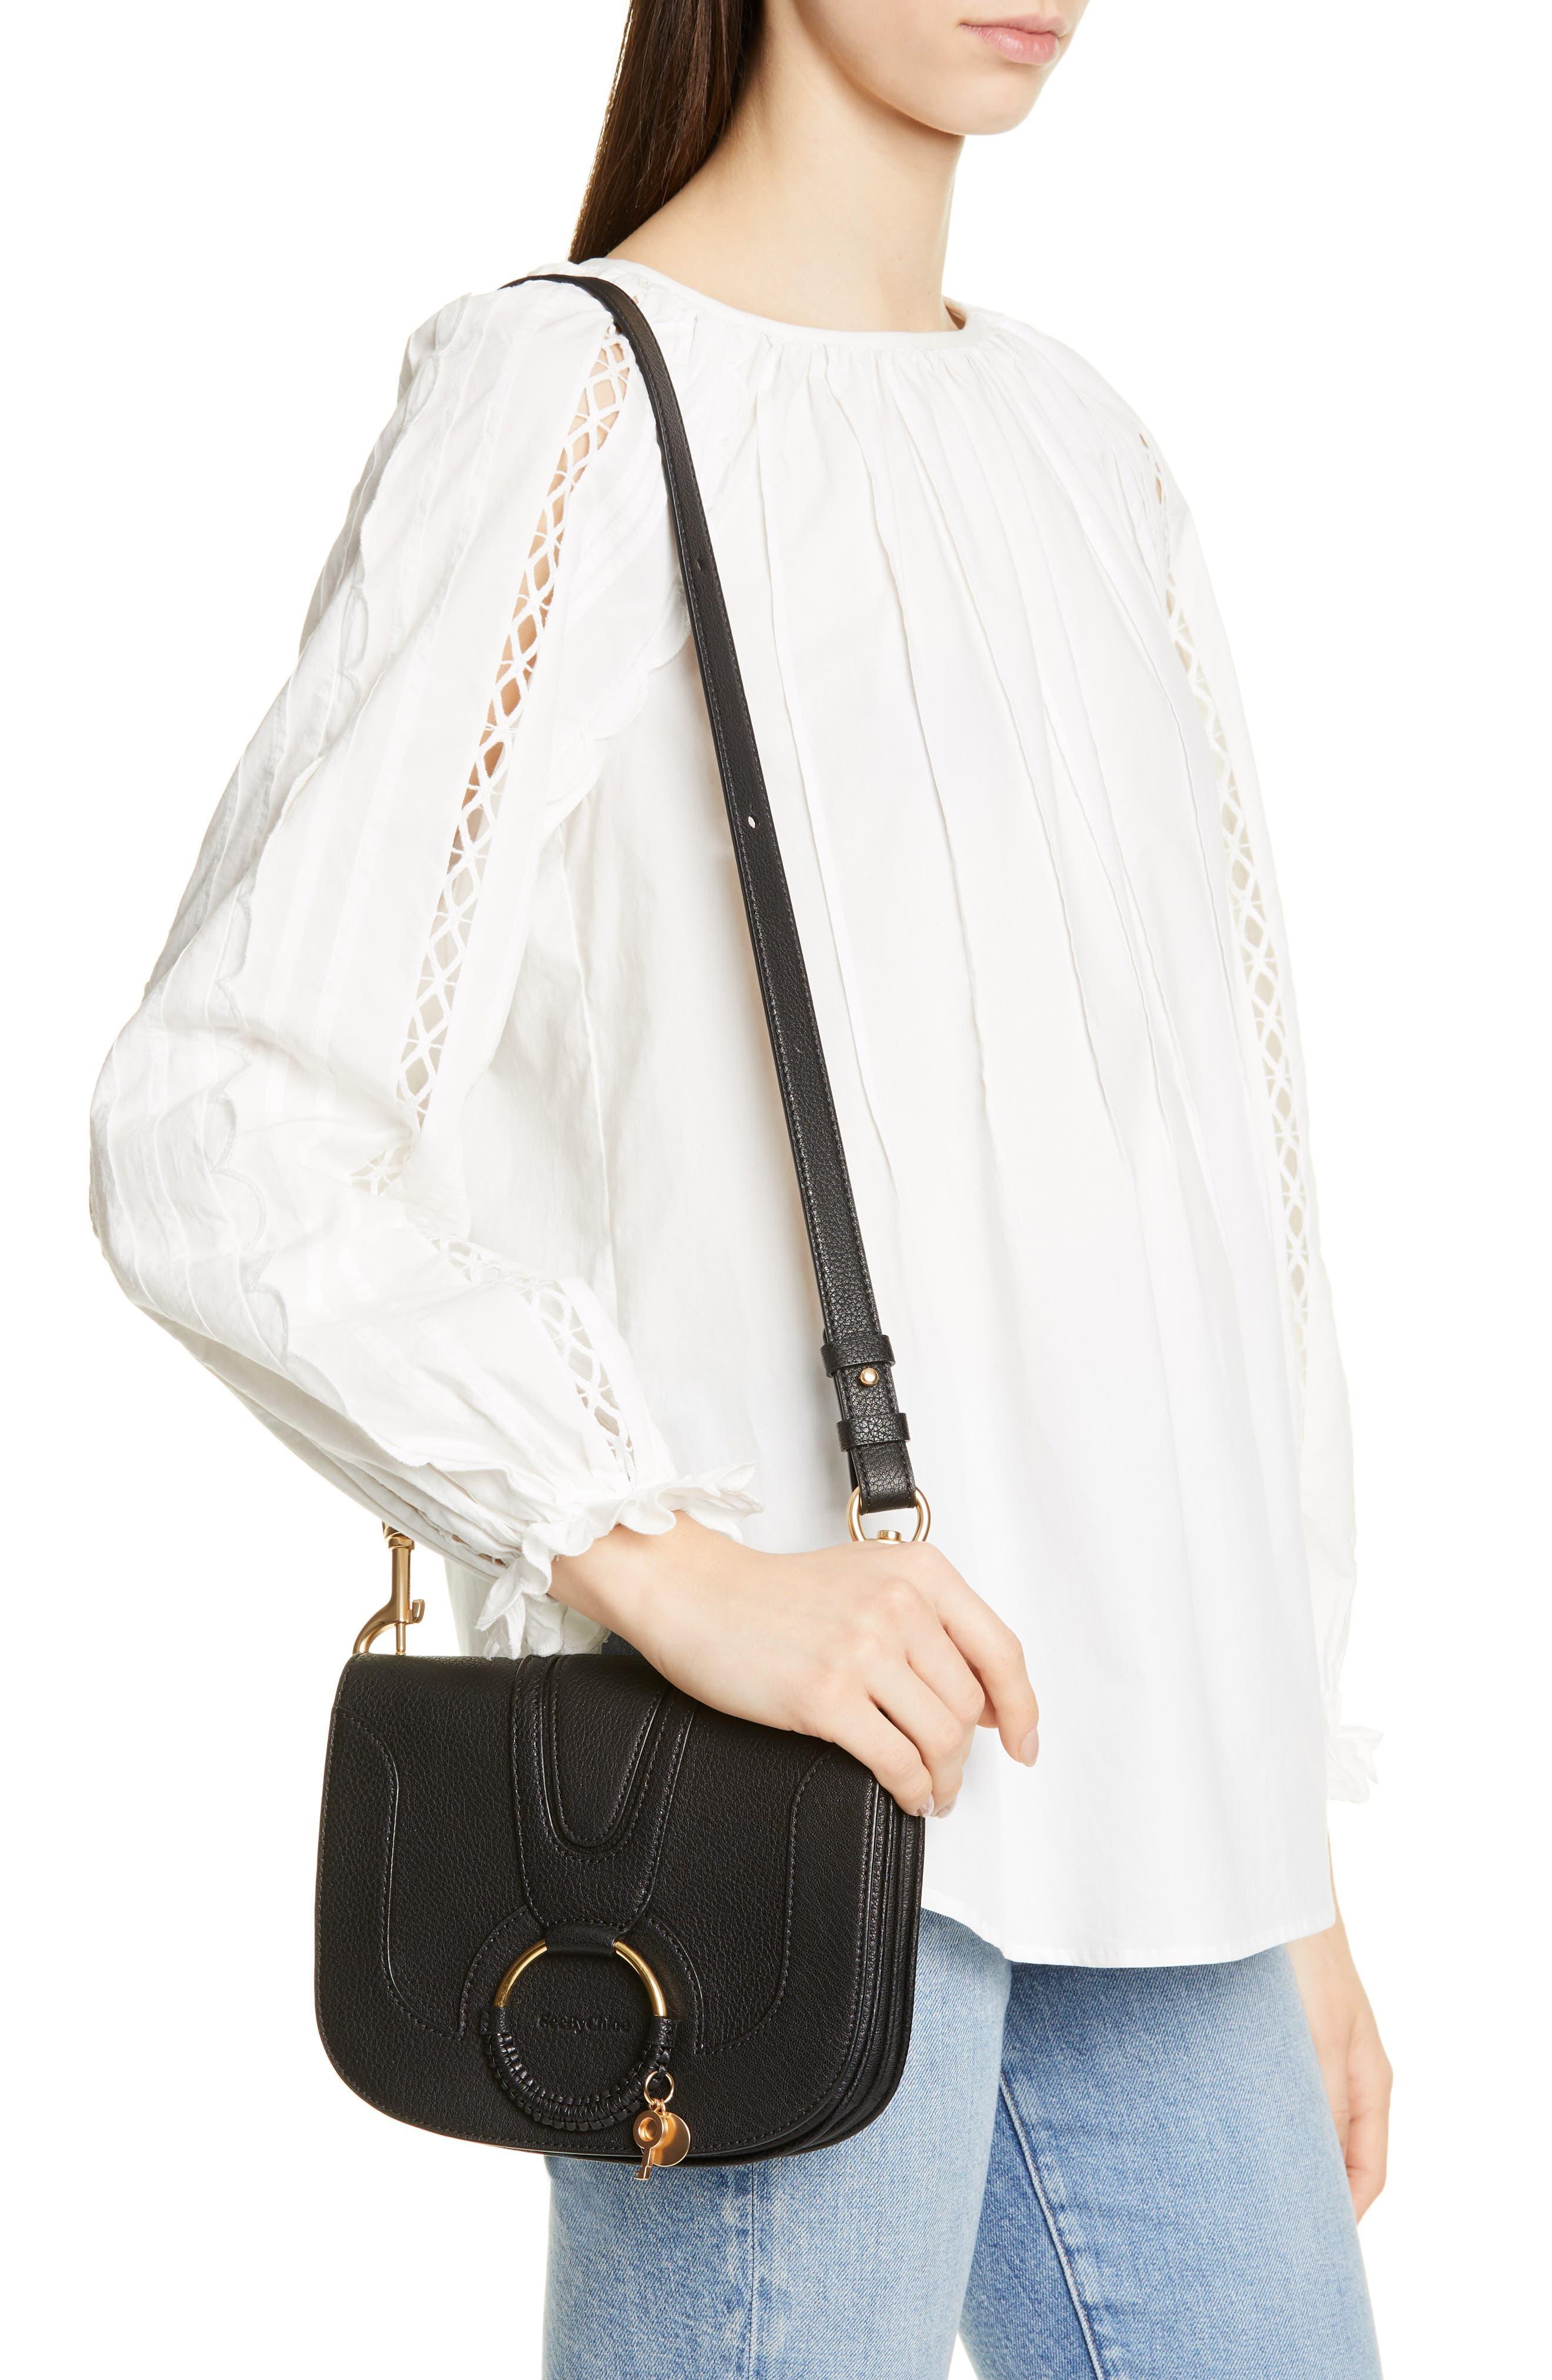 SEE BY CHLOÉ, Hana Small Leather Crossbody Bag, Alternate thumbnail 2, color, 001